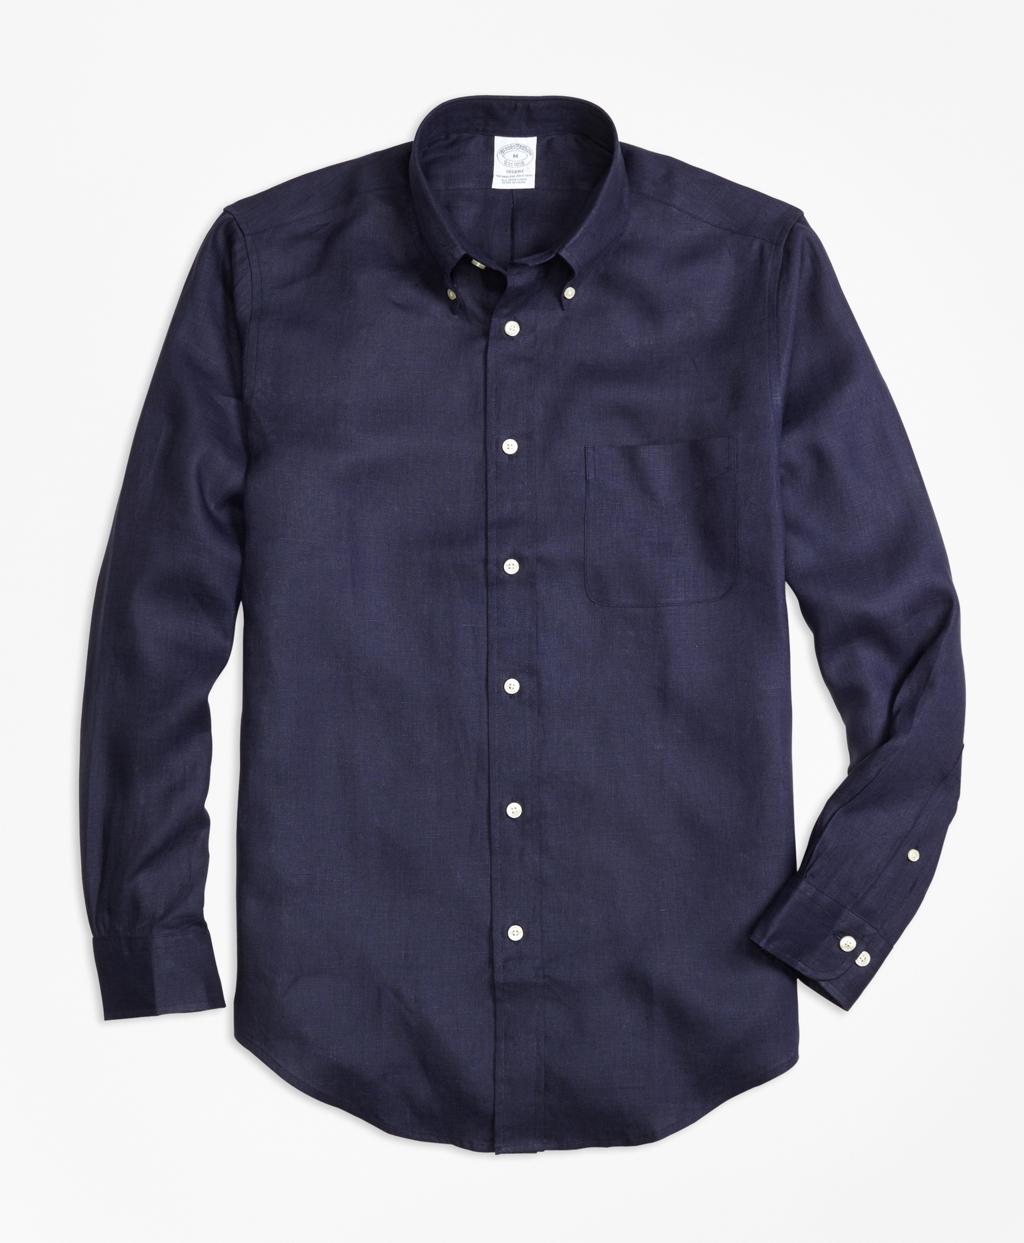 Brooks brothers regent fit irish linen sport shirt in blue for Irish linen dress shirts